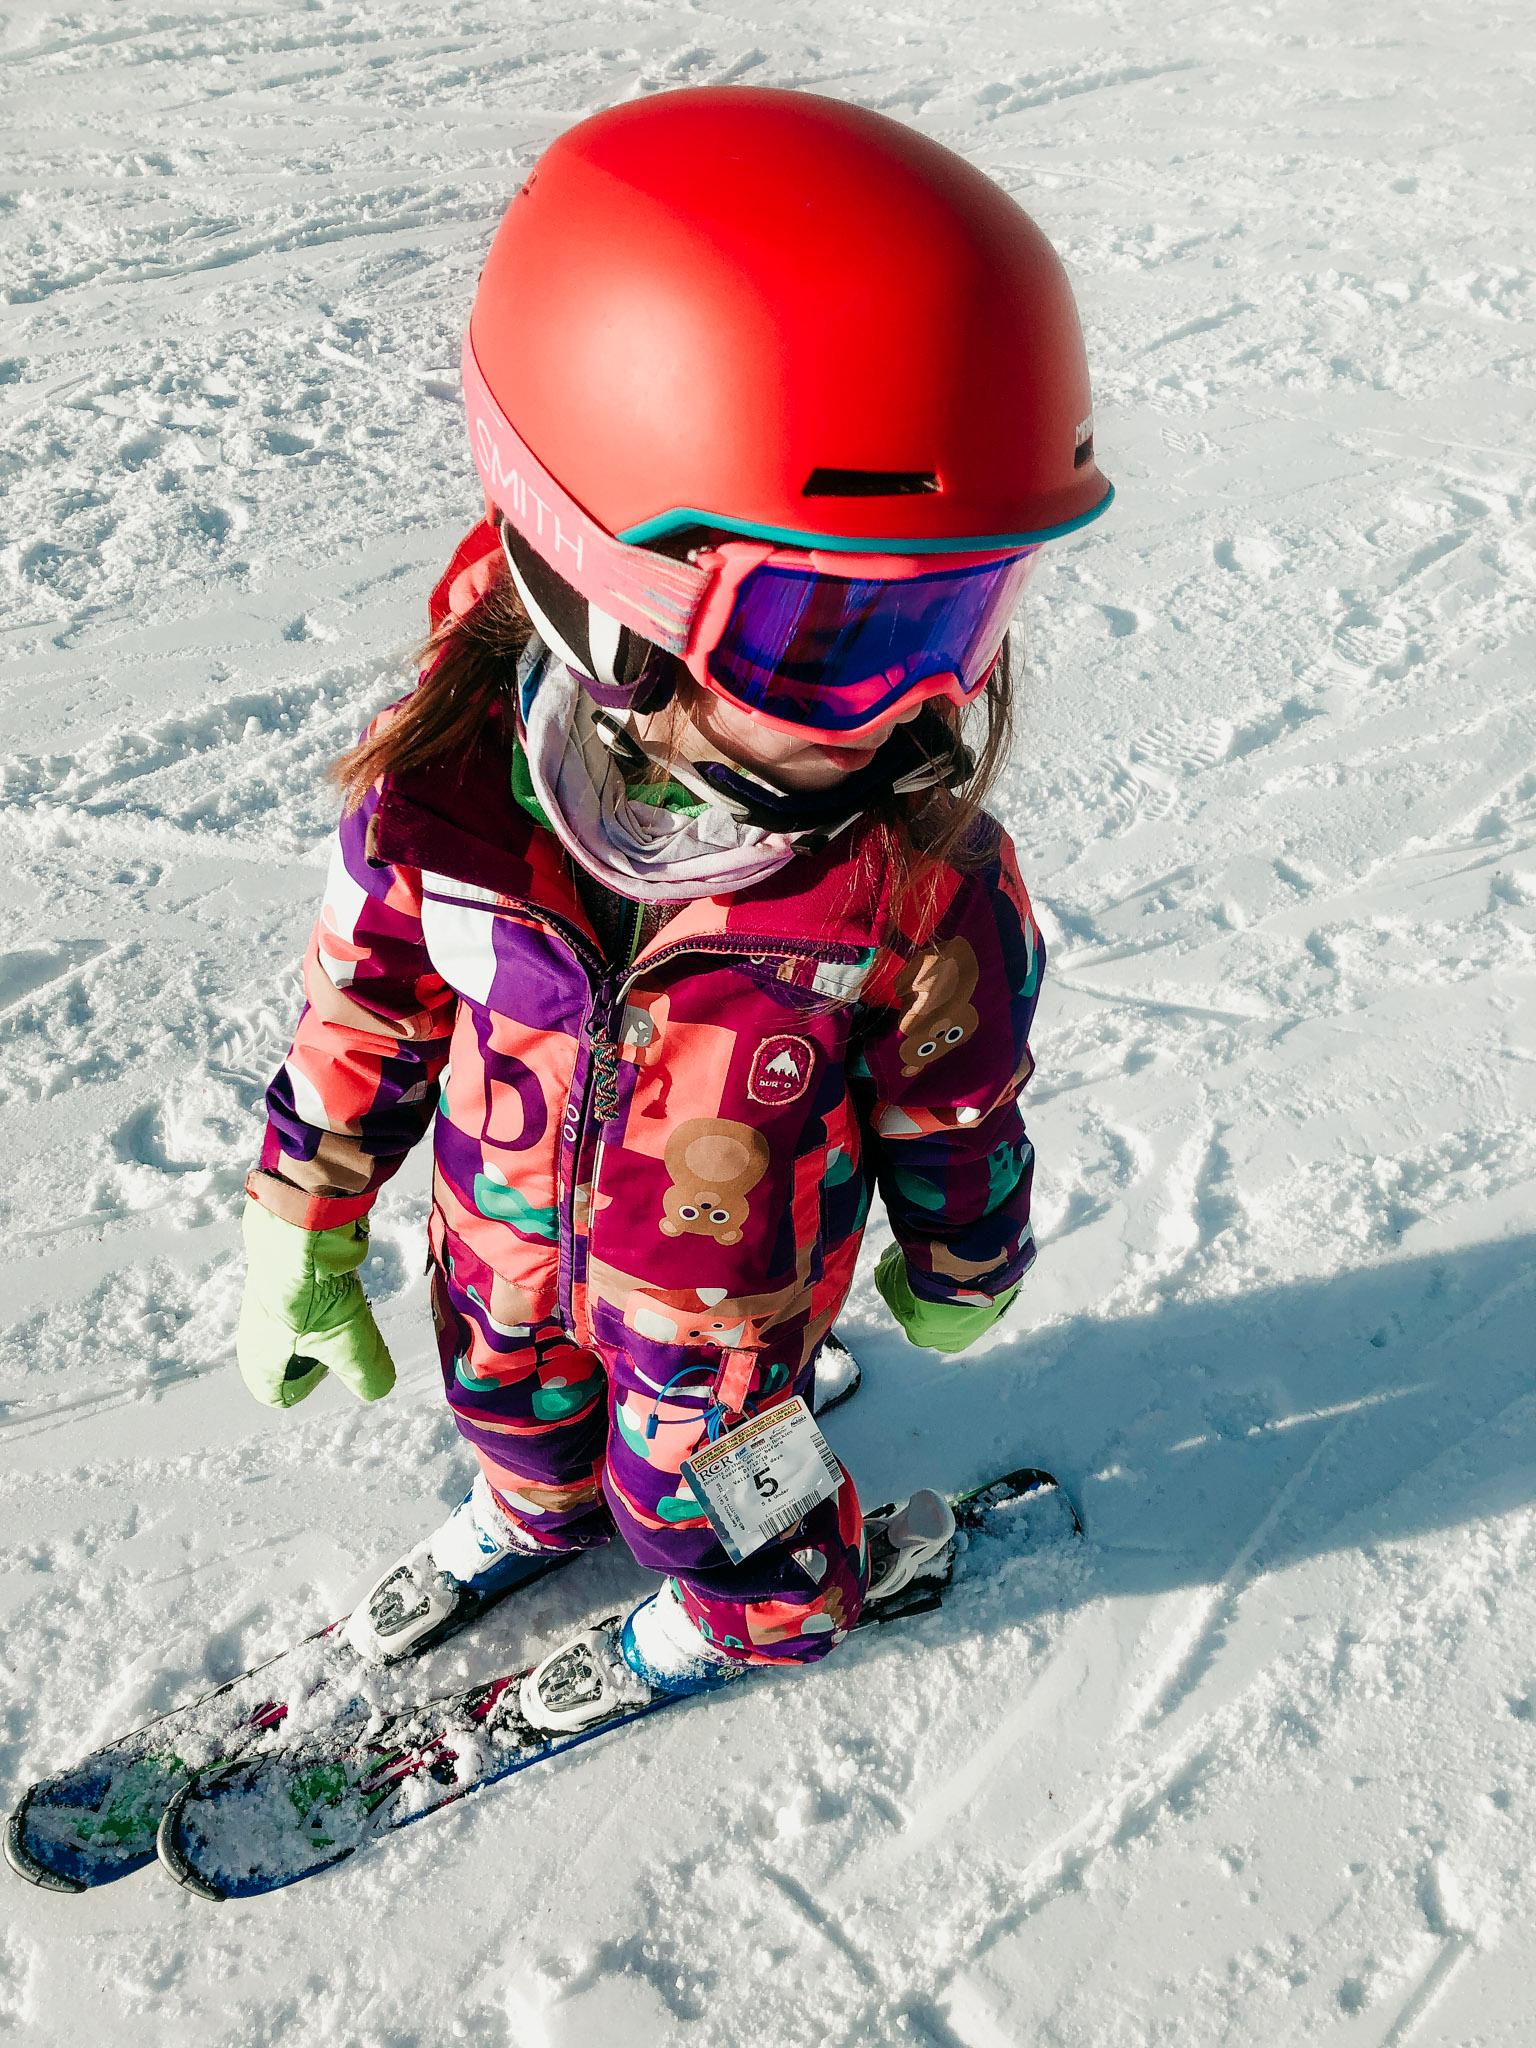 Chelsea Czibere - January 19, 2018 - Nakiska Ski Resort-2.jpg